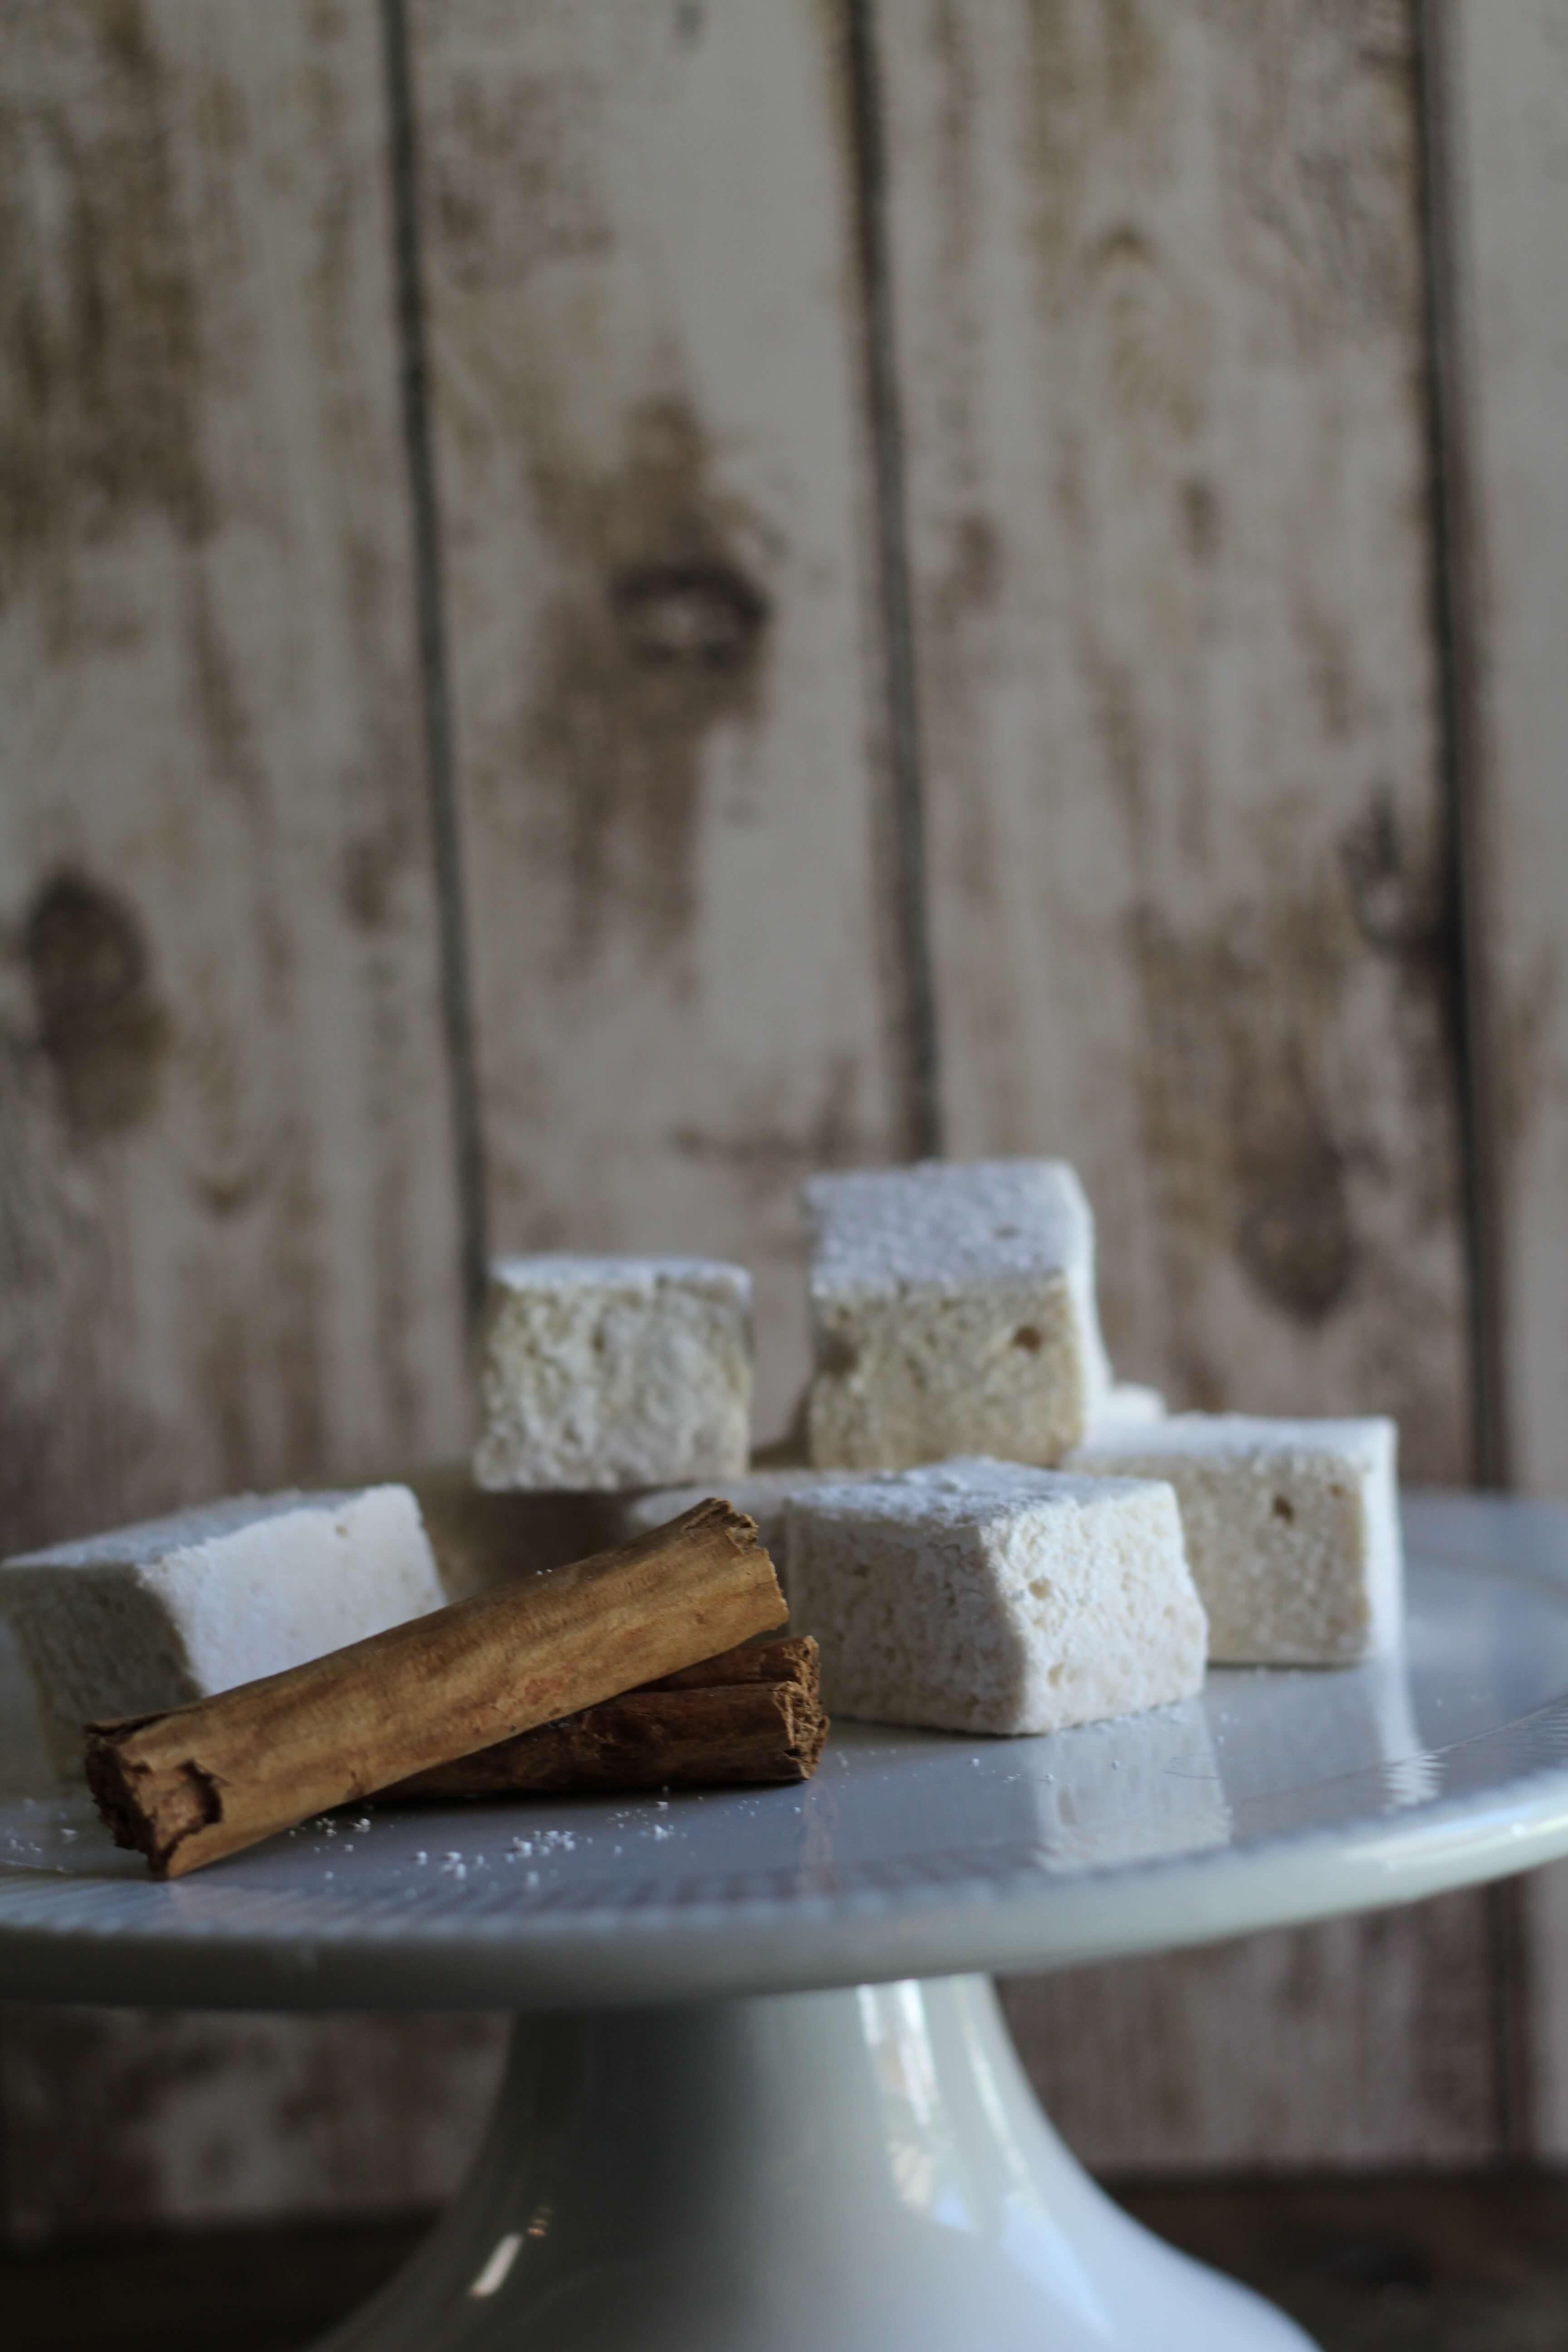 Snickerdoodle Marshmallow Recipes | homemade marshmallows | christmas treat recipes | snickerdoodle recipe ideas | how to make homemade marshmallows | easy marshmallow recipe || Design Dazzle #marshmallow #marshmallowrecipe #snickerdoodlerecipe